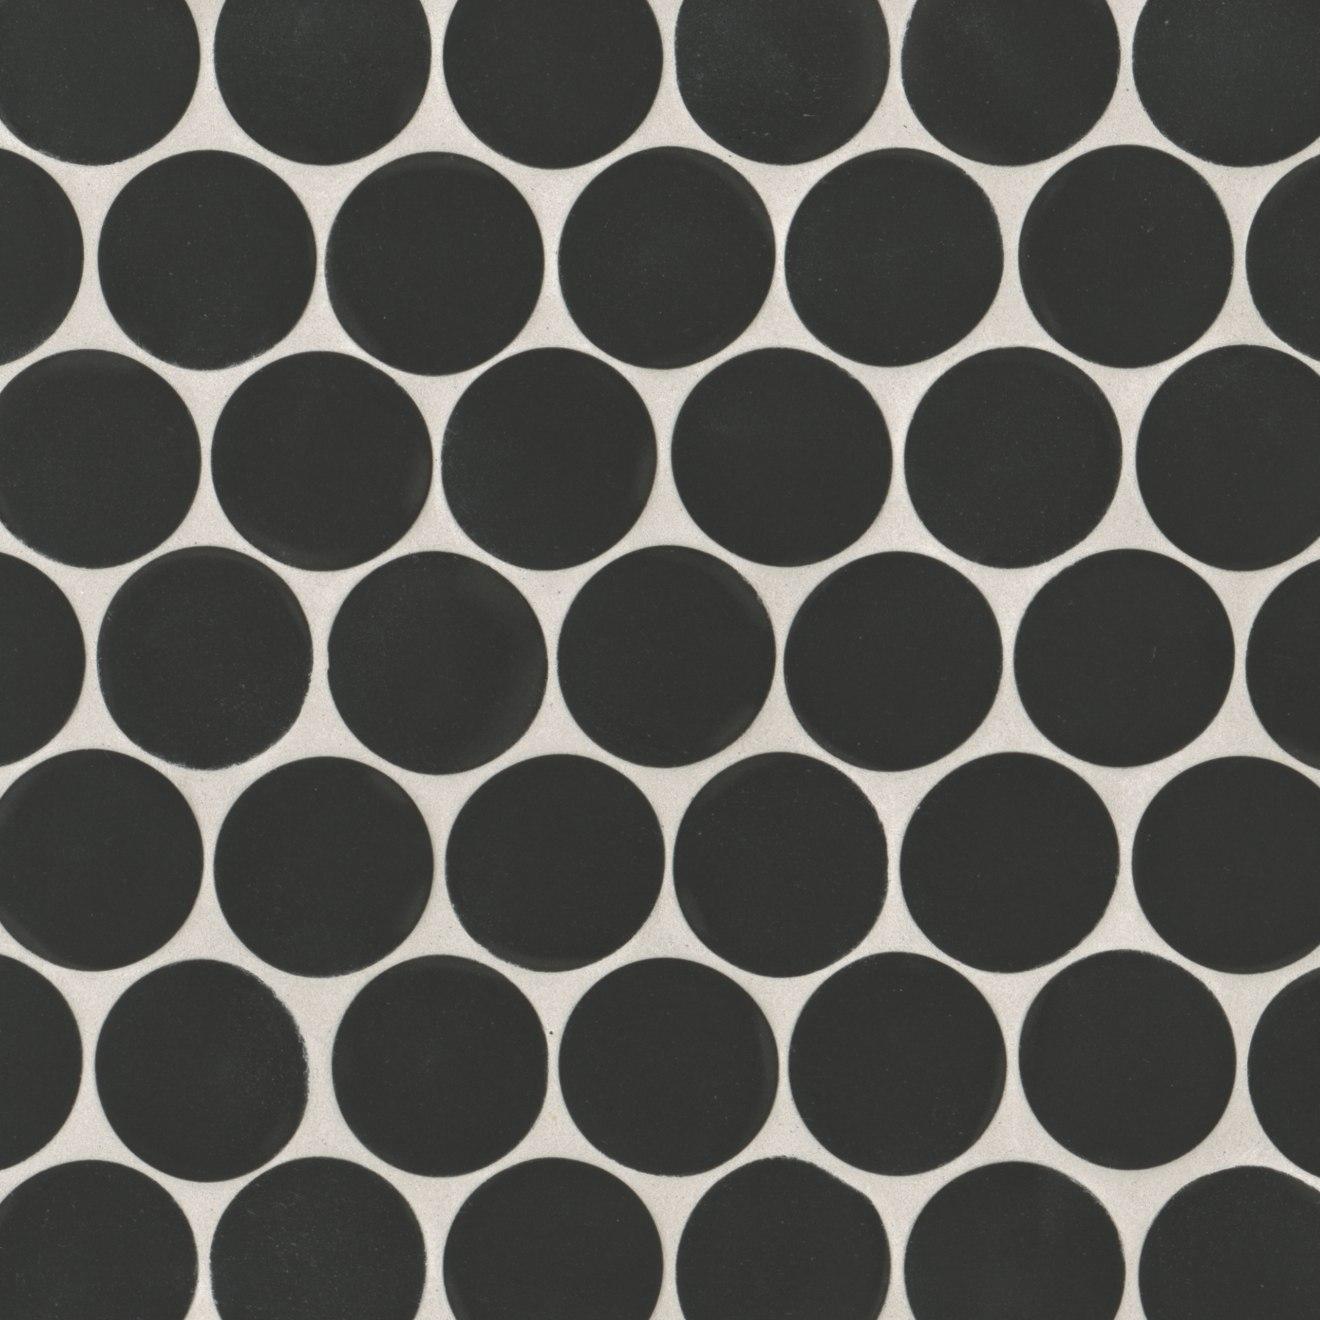 "Shop Makoto 2"" Round Matte Porcelain Mosaic Tile in Kuroi Black from Bedrosians on Openhaus"